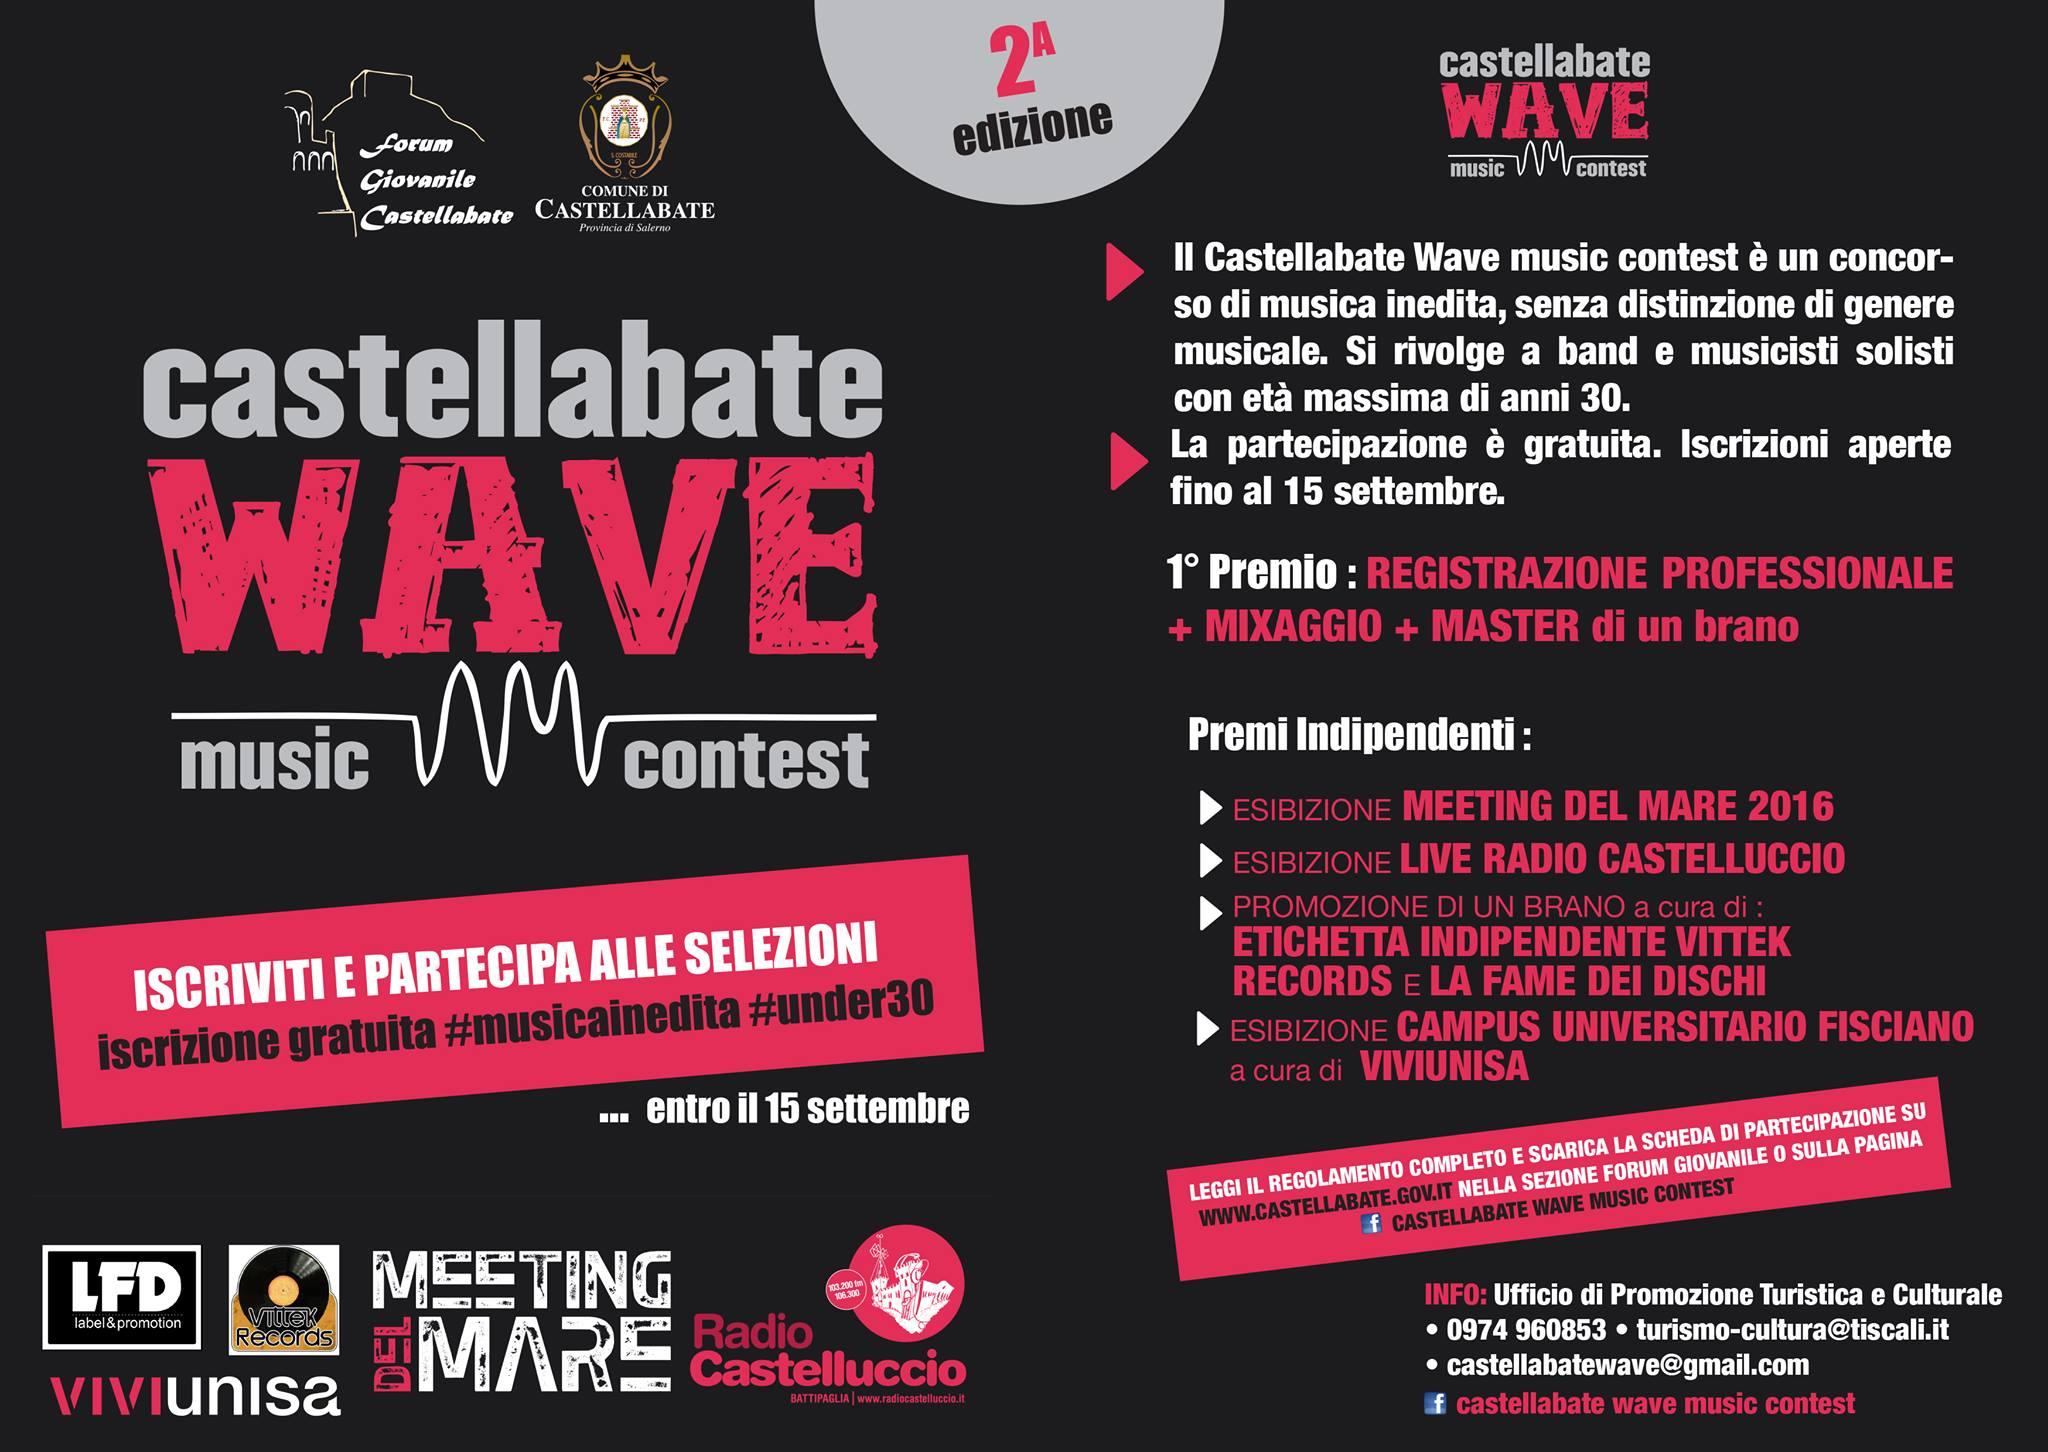 Castellabate wave music contest 2015